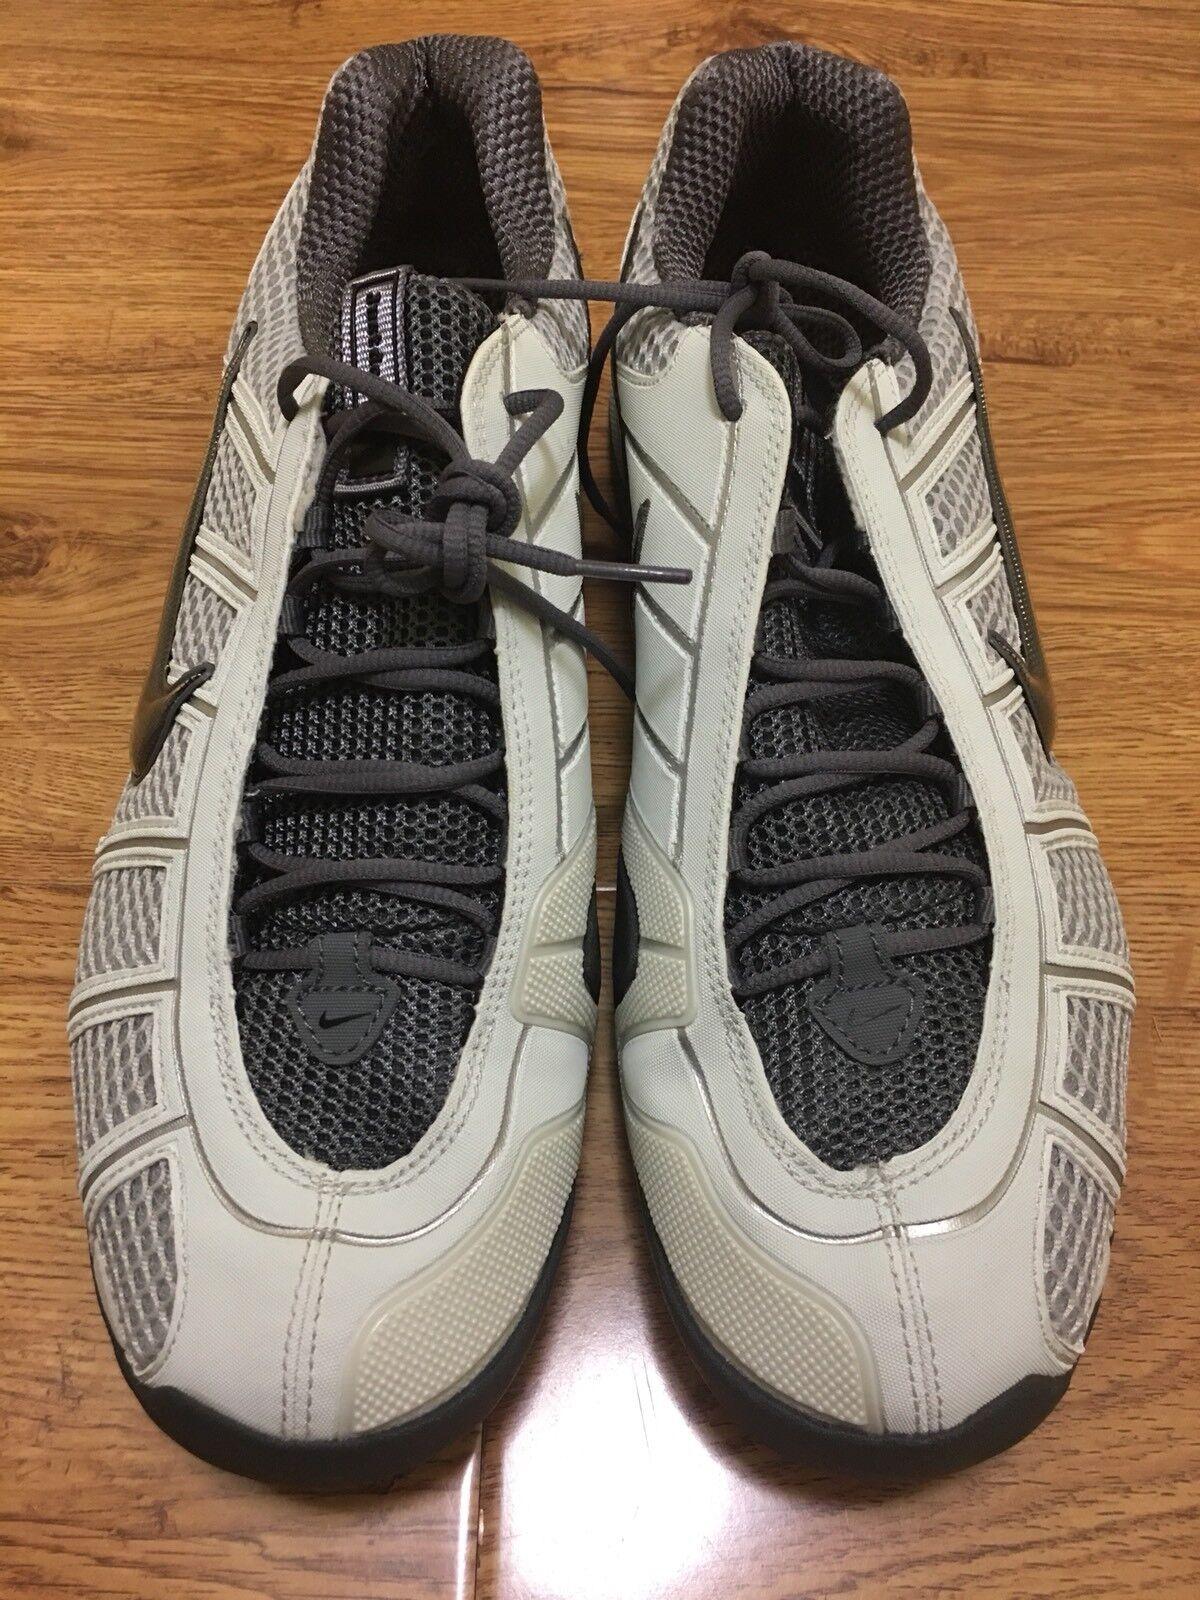 Nuevos zapatos Hombres de Nike Zoom Ballestra tirador de Hombres esgrima del tamaño de 12,5 804e86